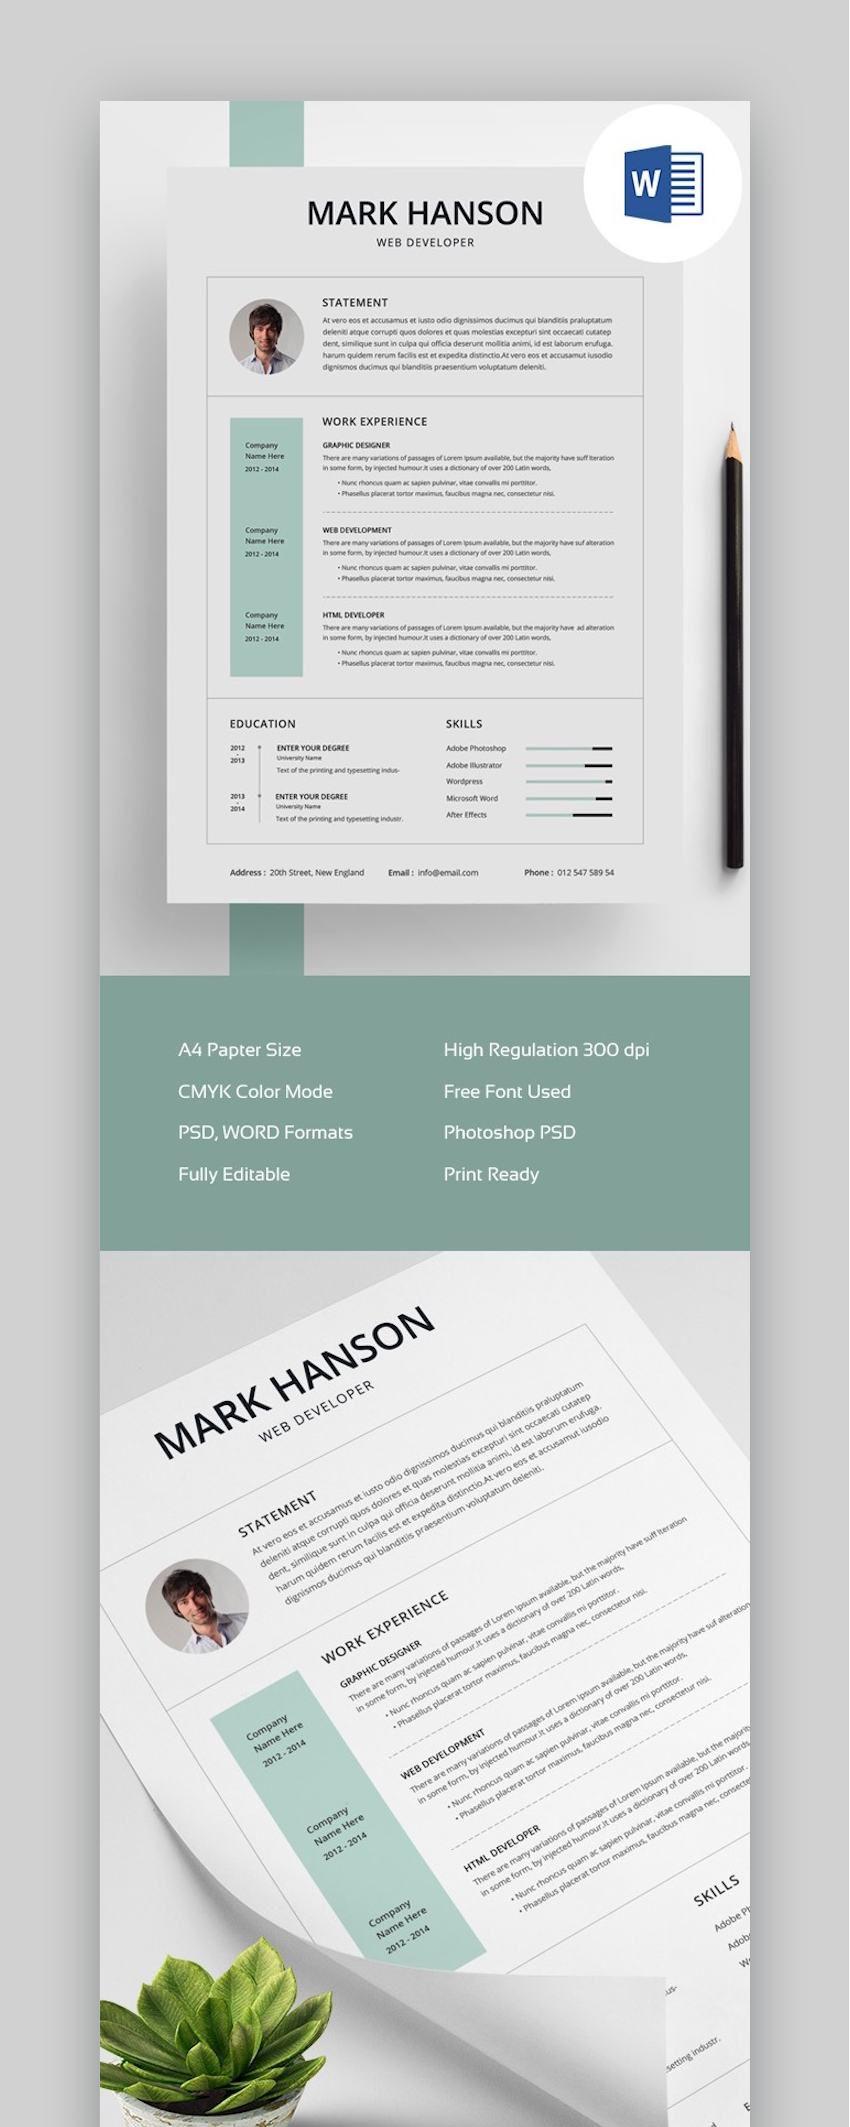 004 Impressive Adobe Photoshop Resume Template Free Design  DownloadFull